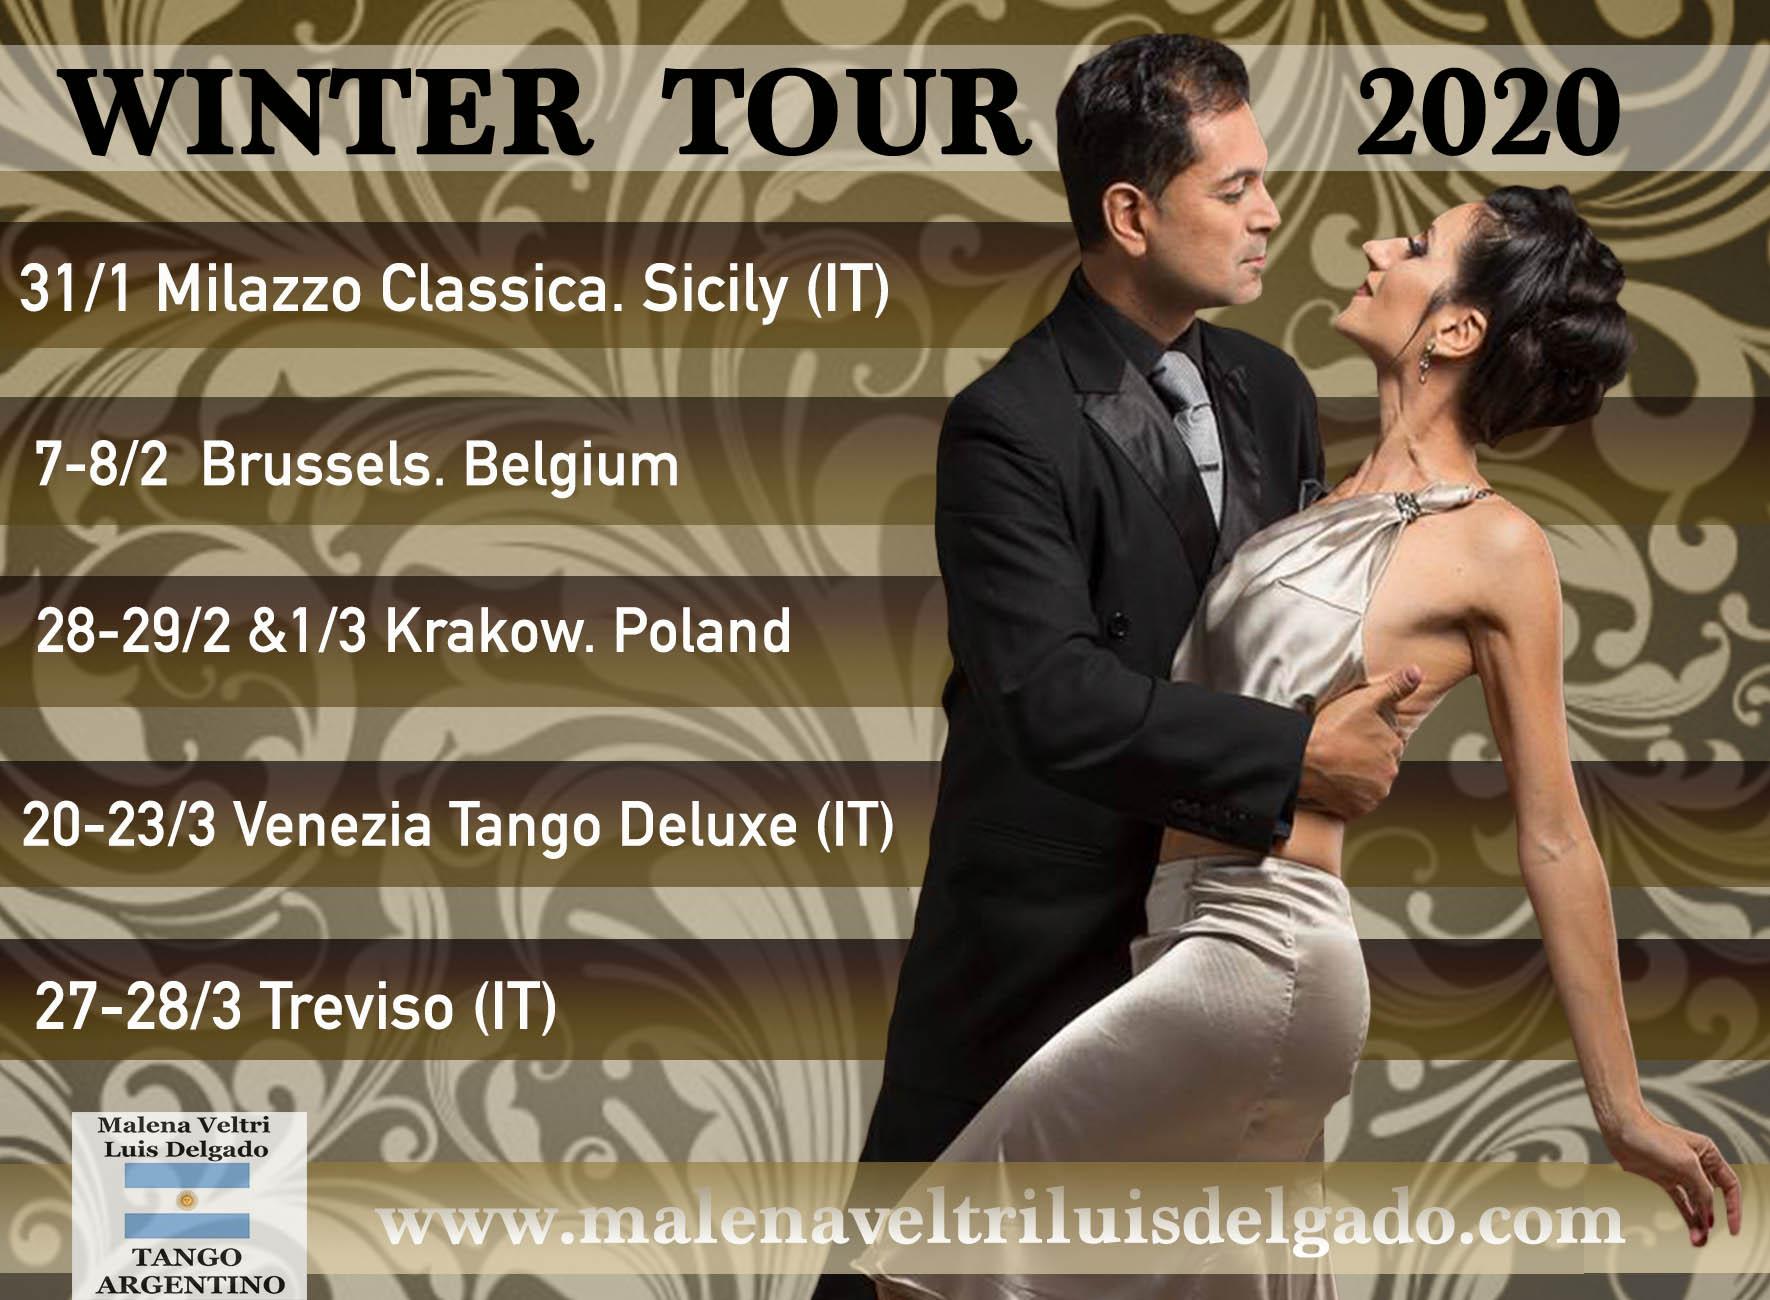 Wintertour2020